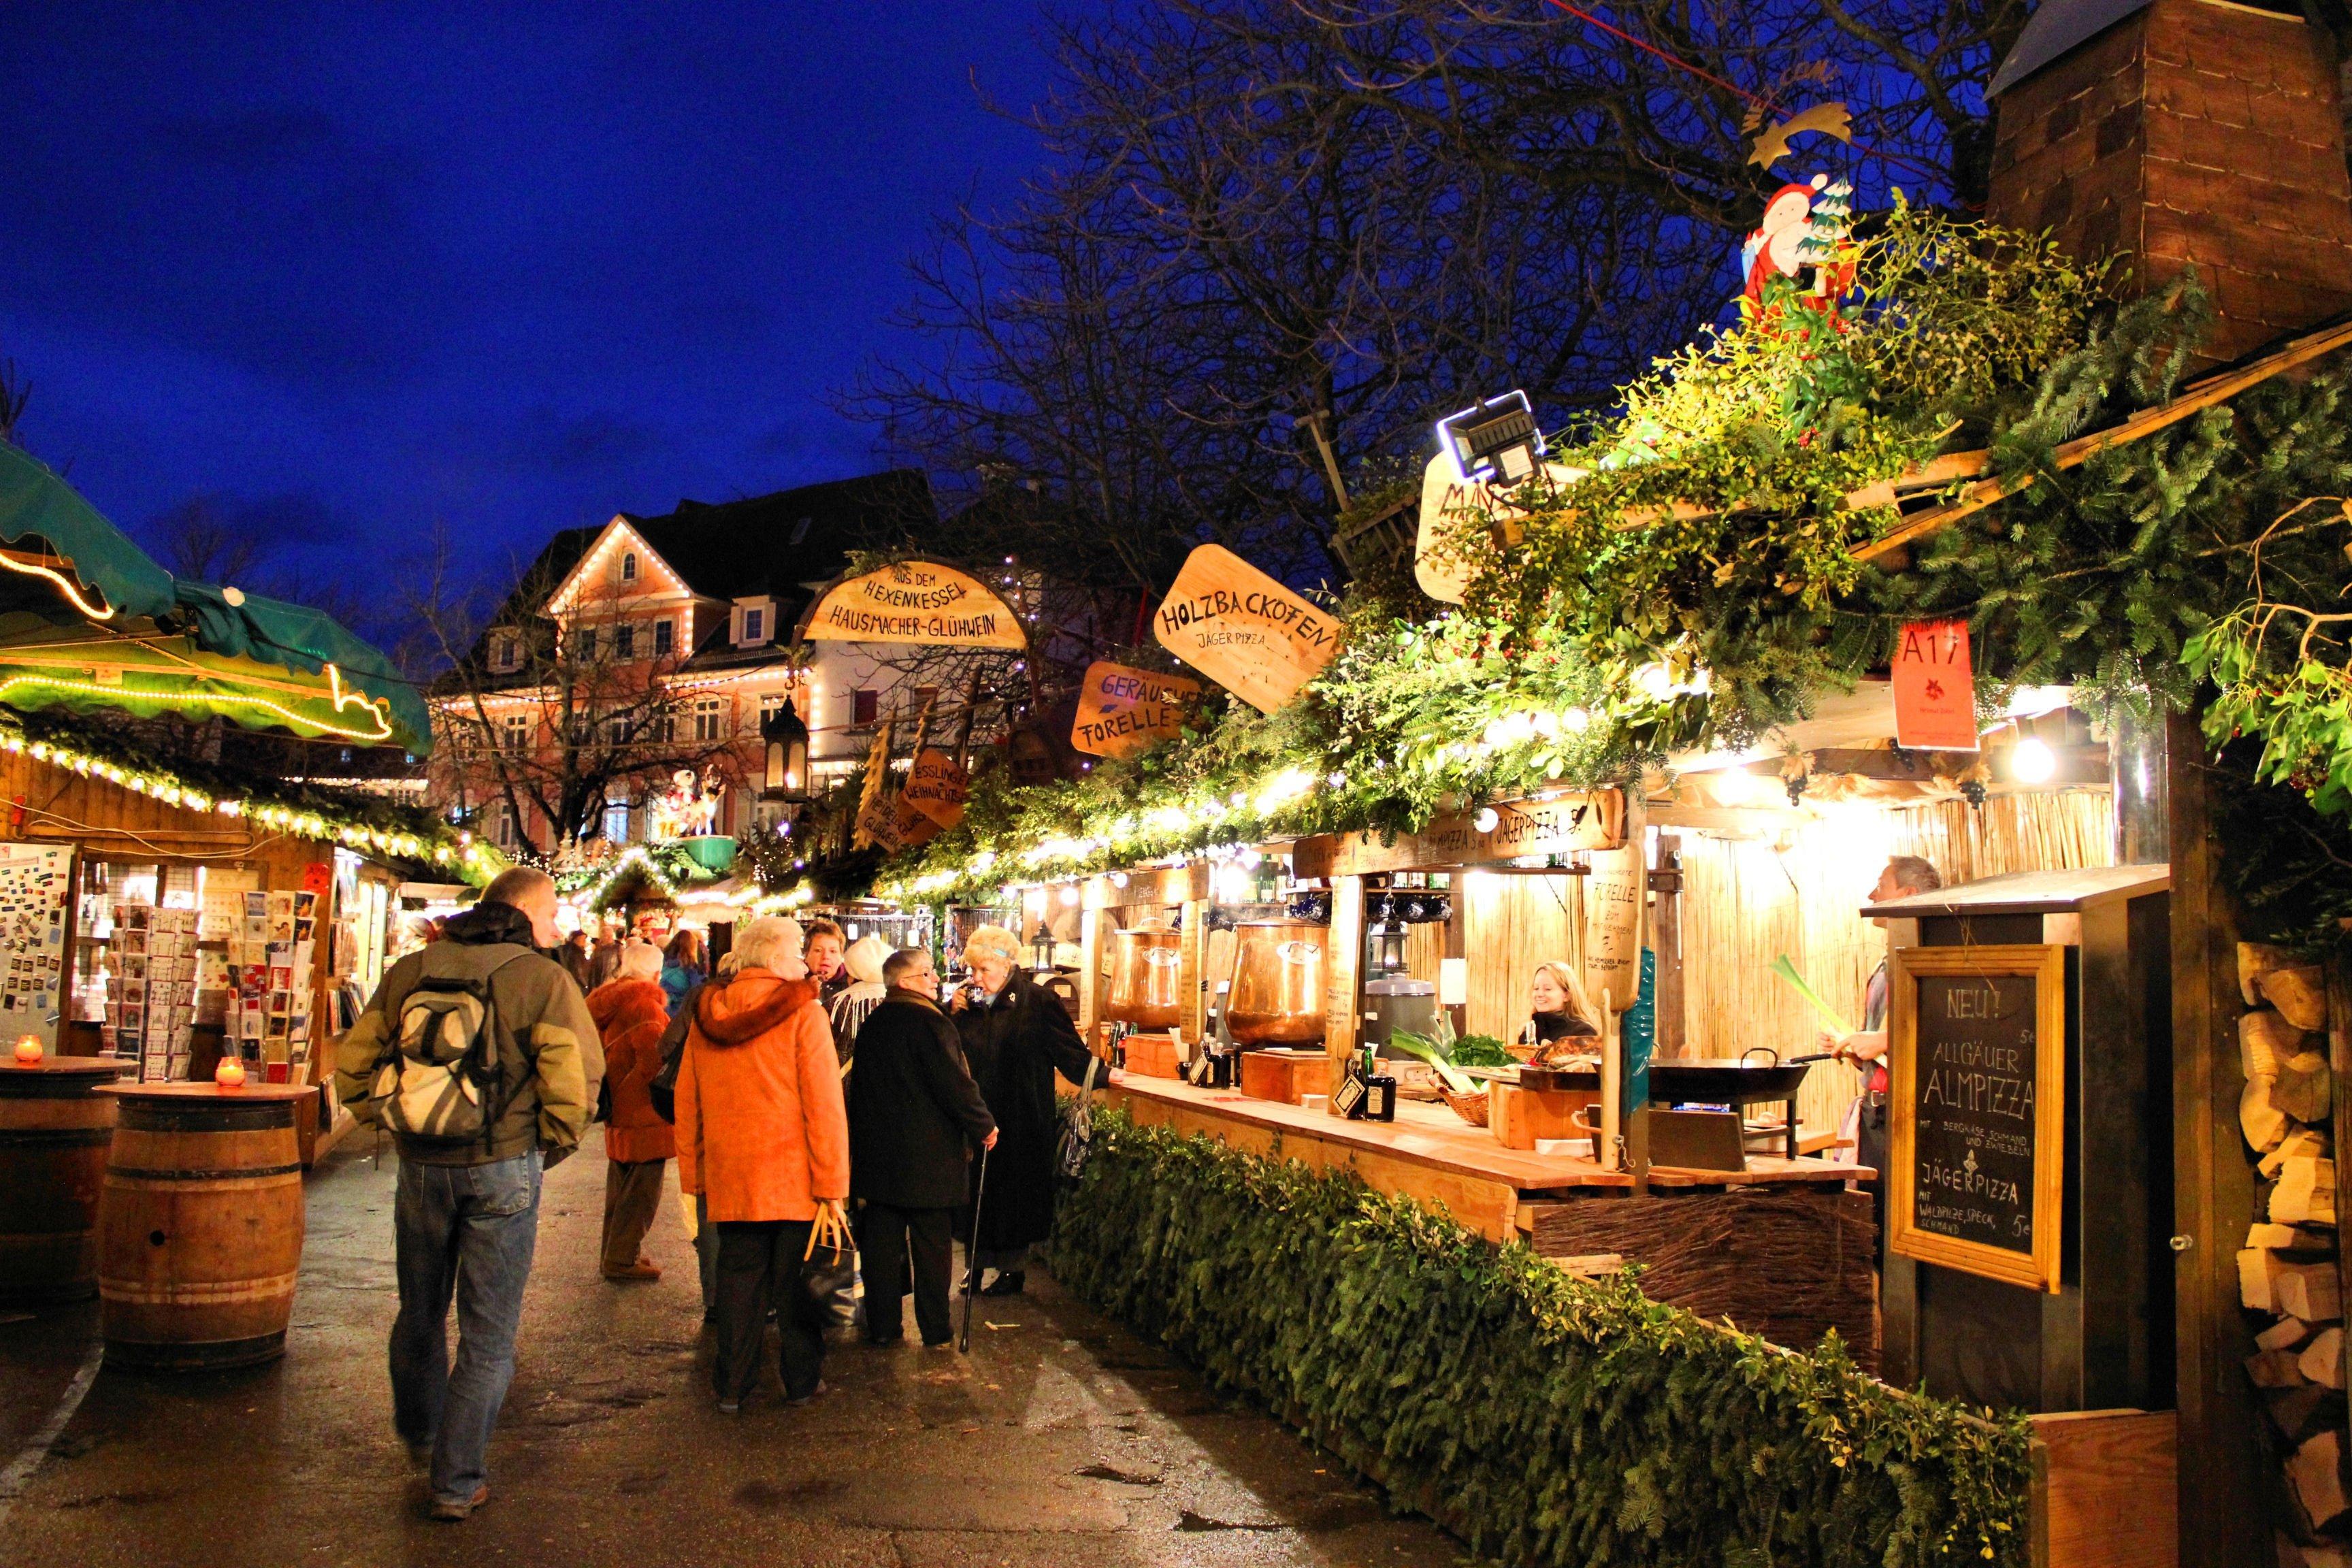 esslingen christmas market - 《歐洲嘉年華、德國啤酒節》台北101限時登場!集結11國歐陸主題美食小帳篷!